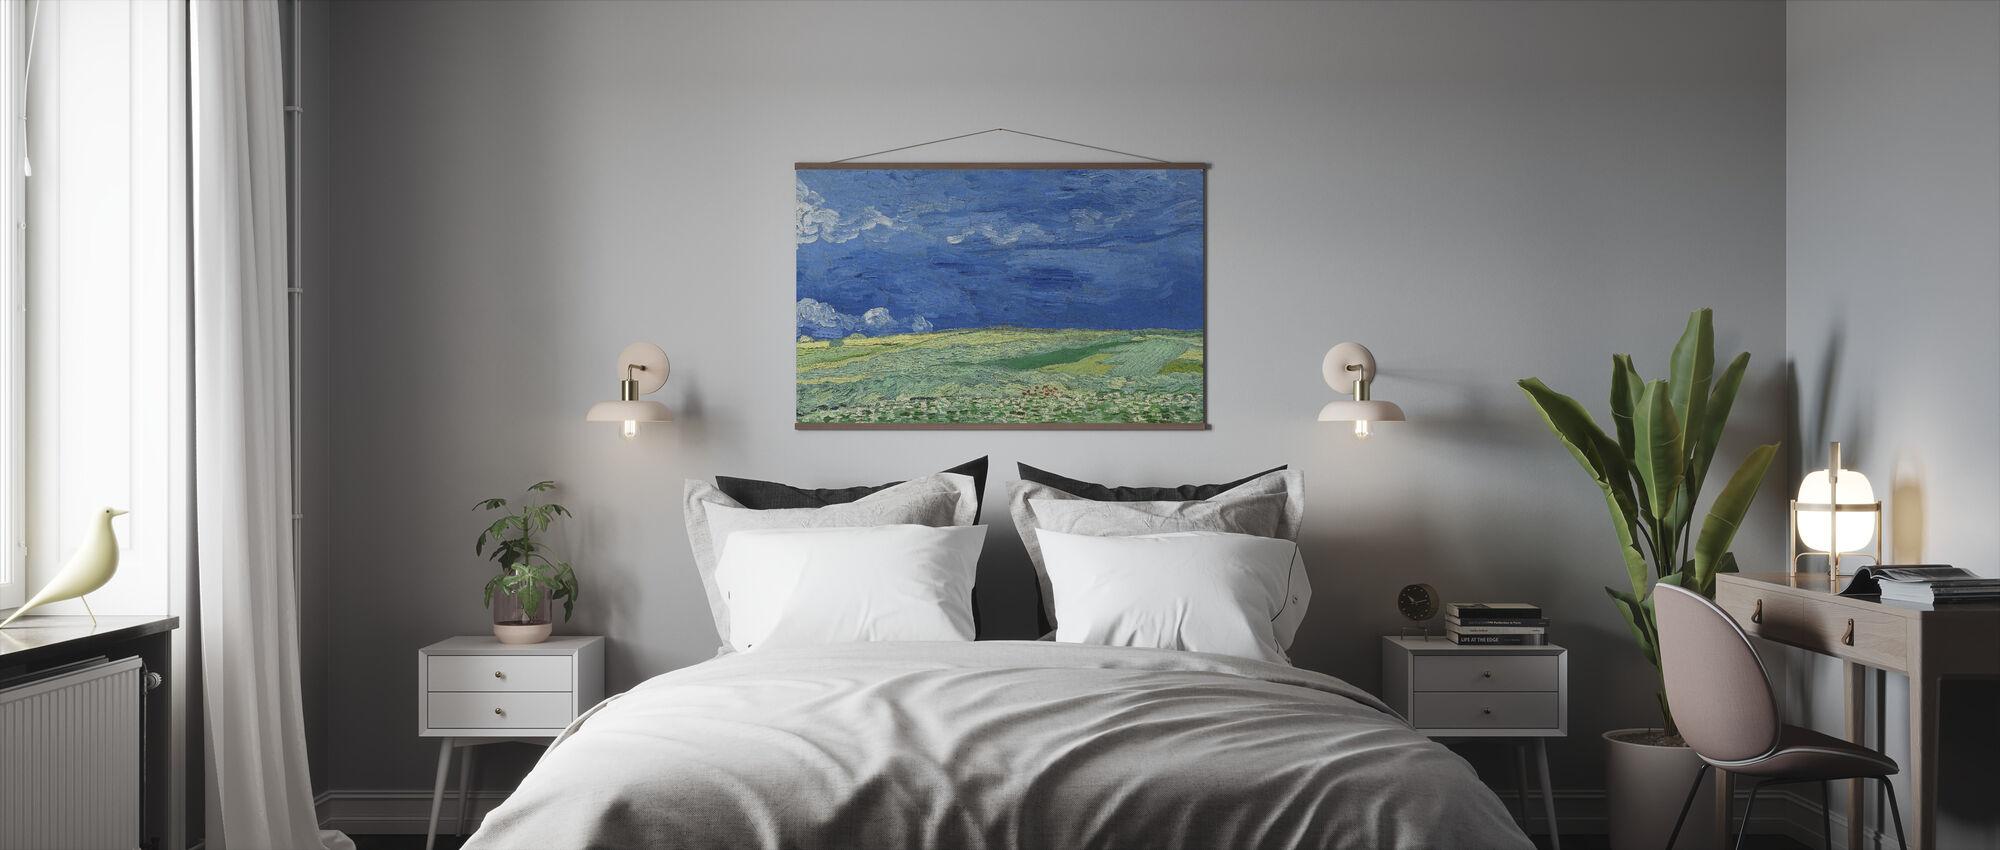 Wheatfield - Vincent Van Gogh - Poster - Sovrum